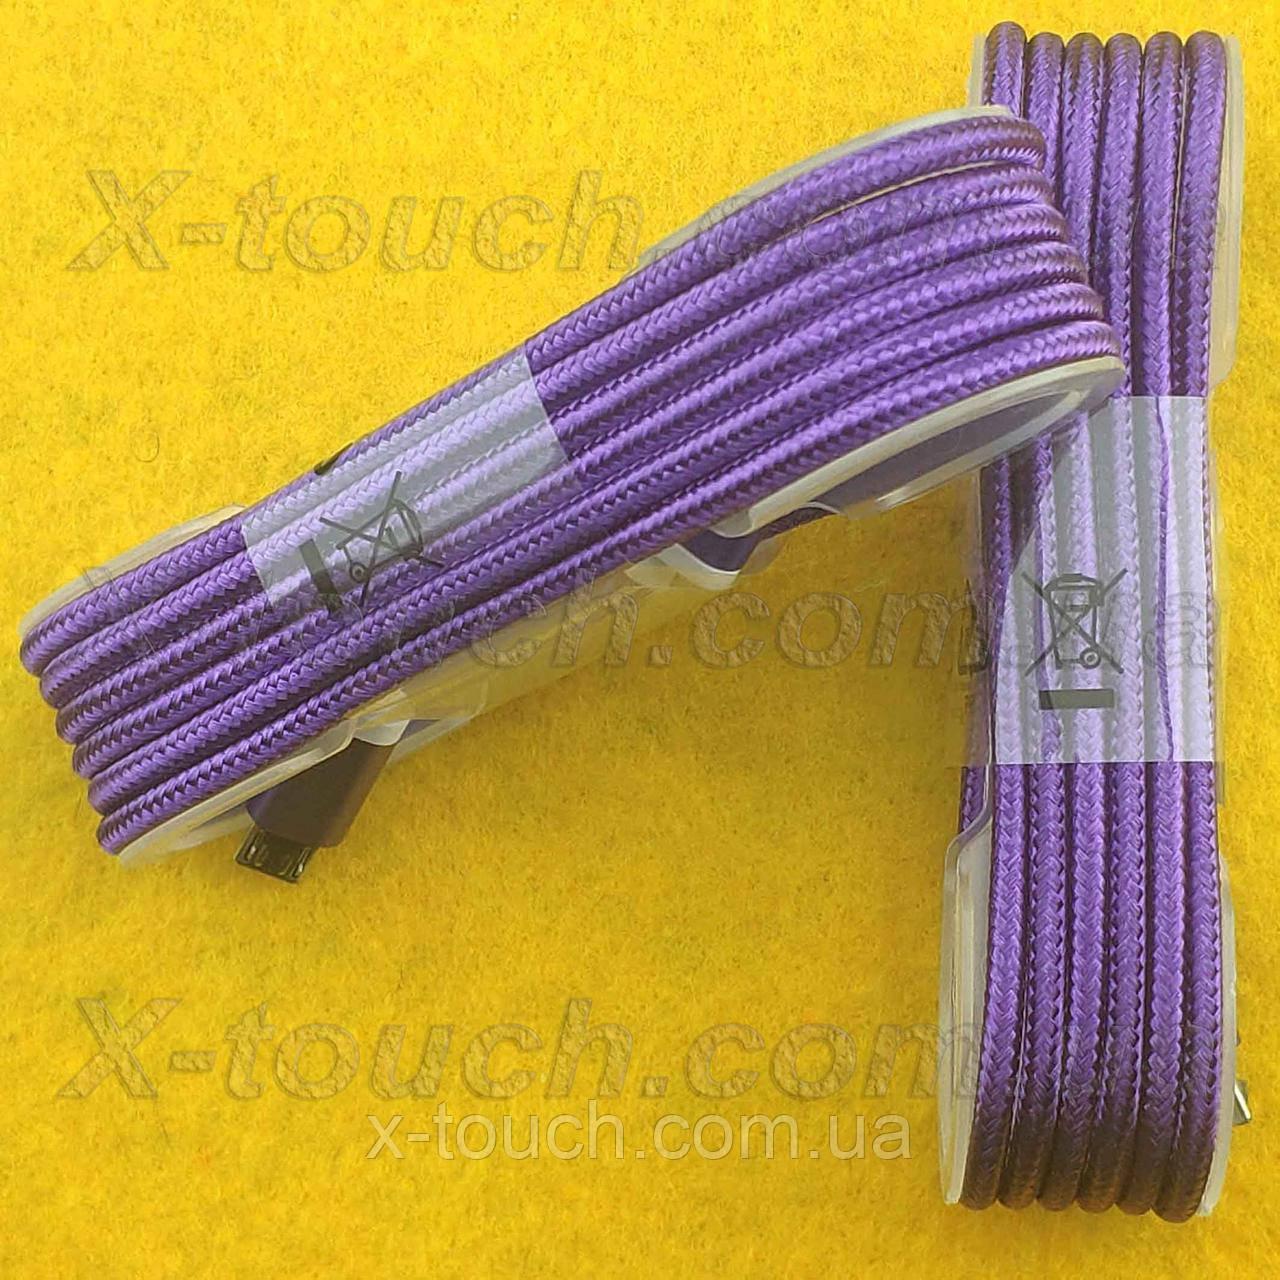 USB - Micro USB кабель в тканевой оболочке 1.5 м, Шнур micro usb 2.0 Bravis ( цвет фиолетовый)